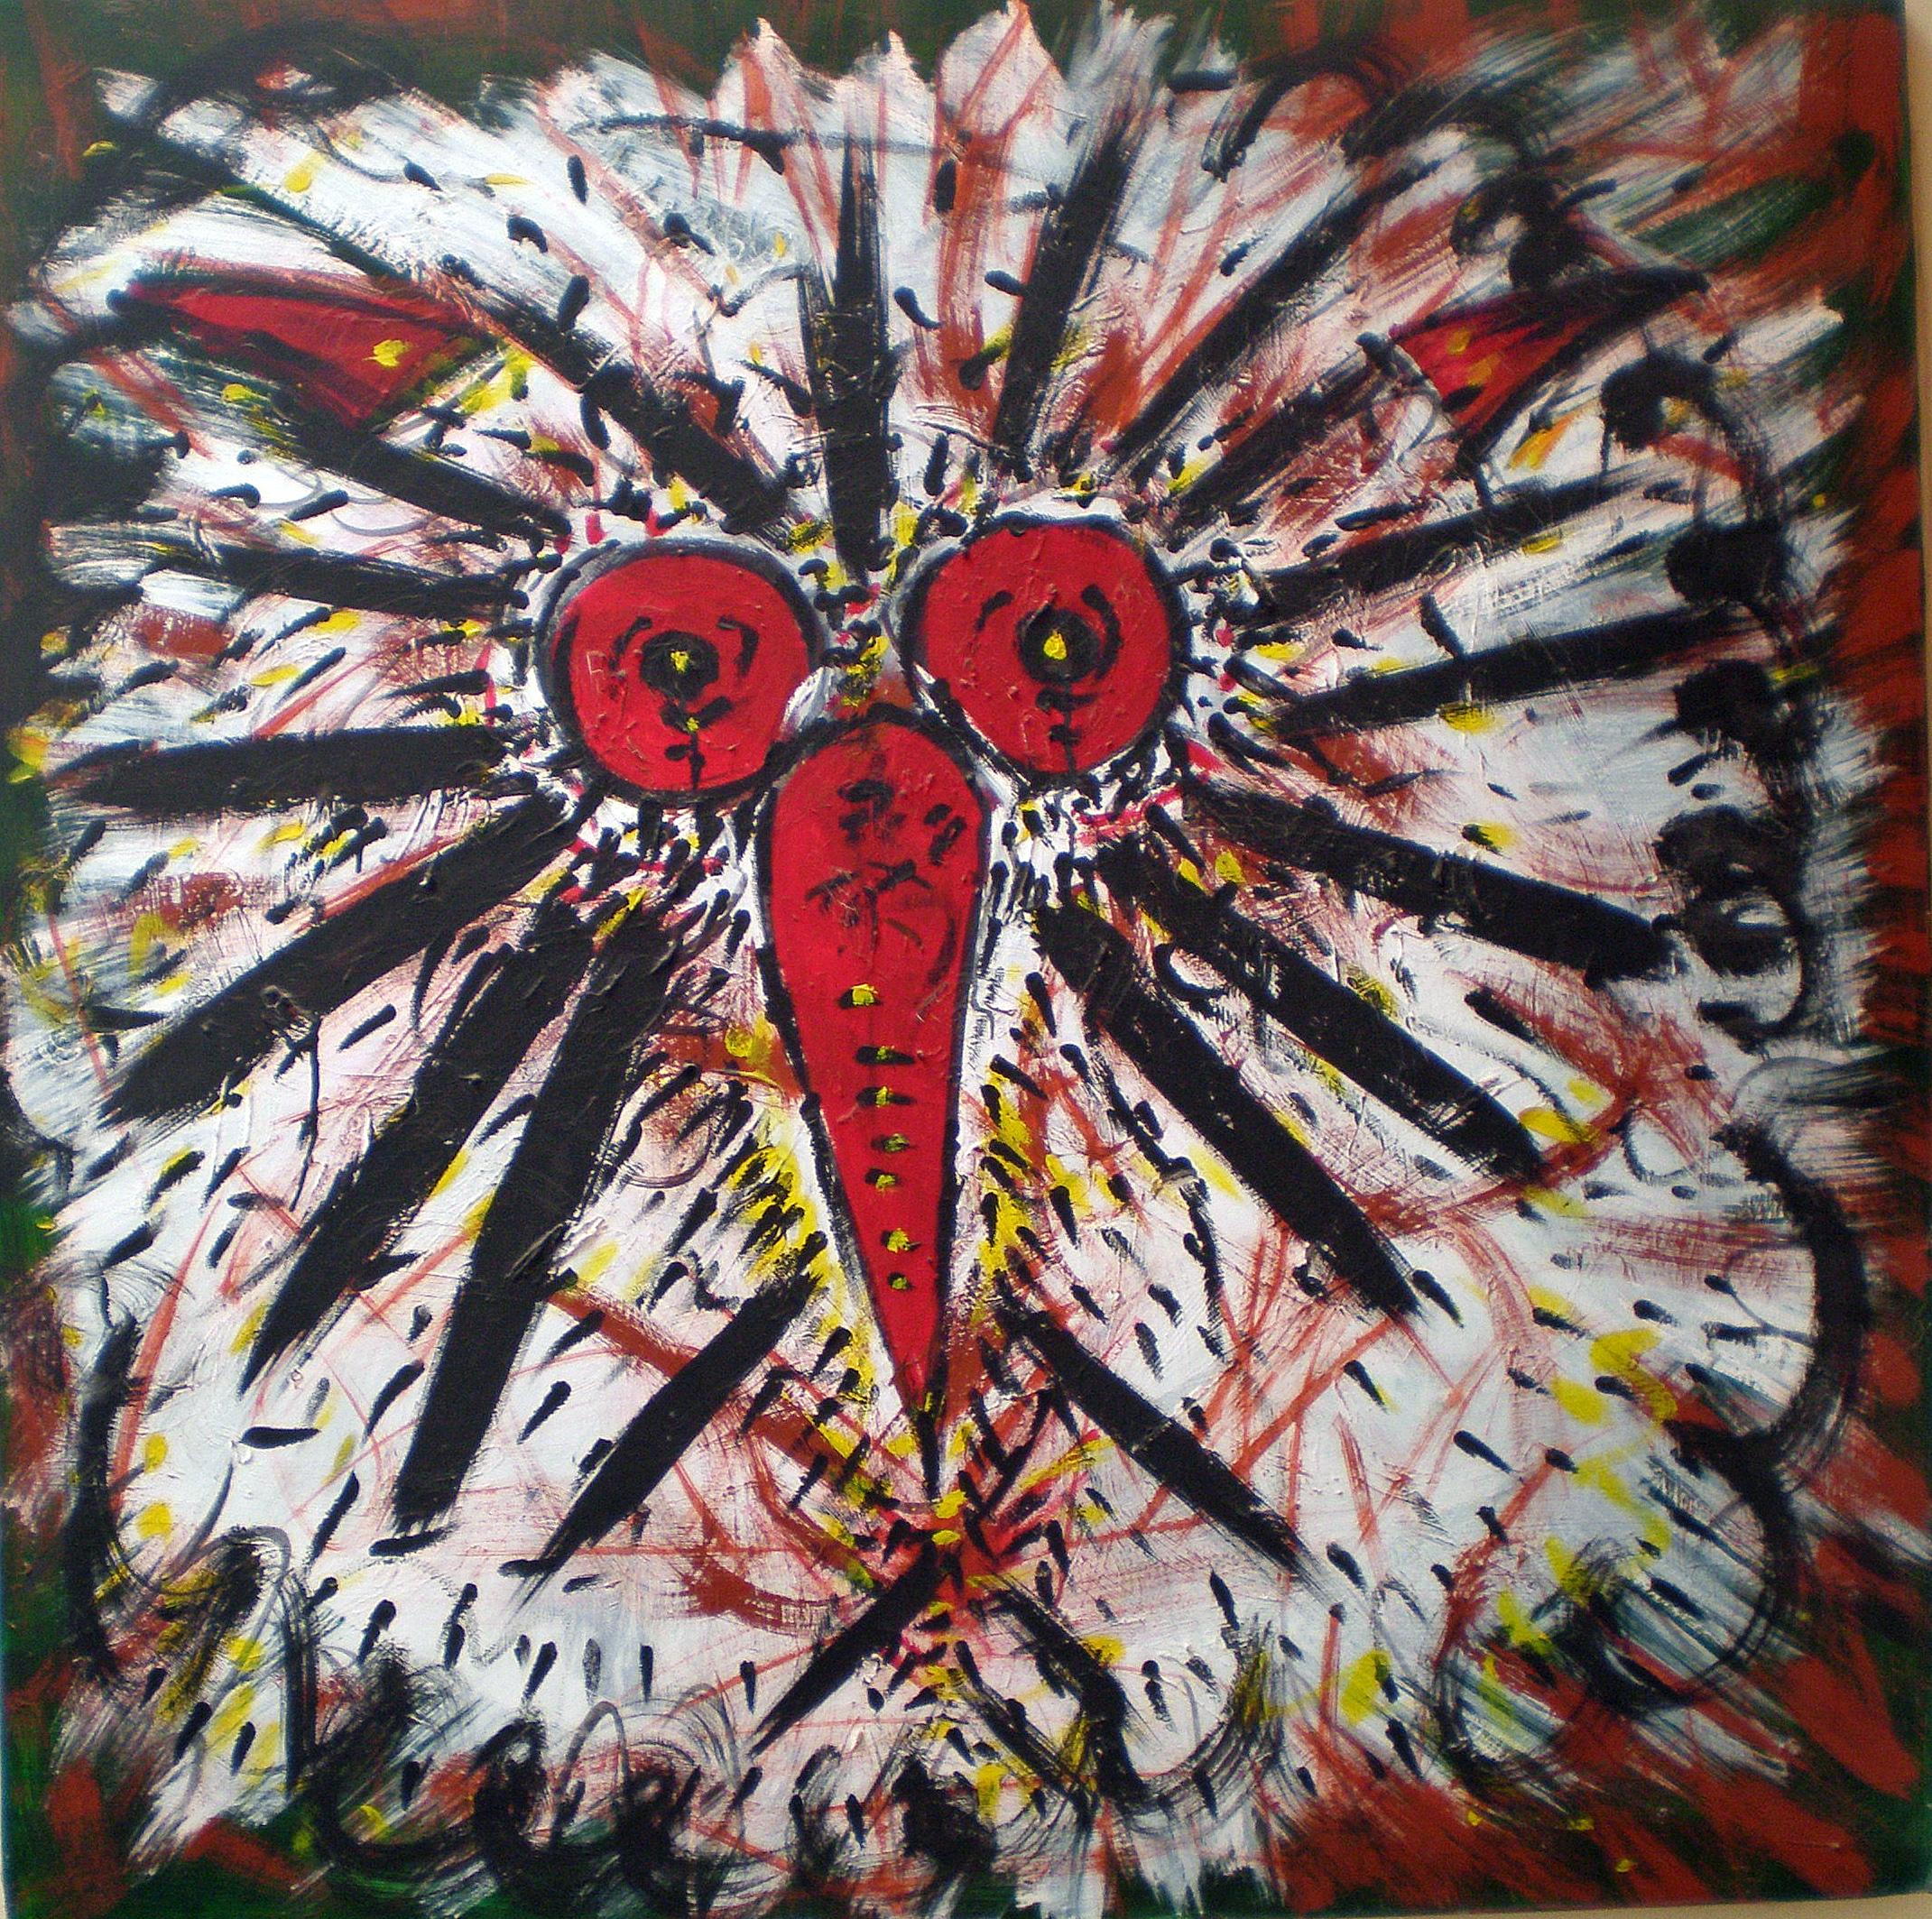 Un'espressione attonita di un gufo (A stunned expression of an owl), 1994 dipinto acrilico su tela ( painting acrylic on canvas) cm 100x100, Pio Mastrogiacomo, Acerno (SA).